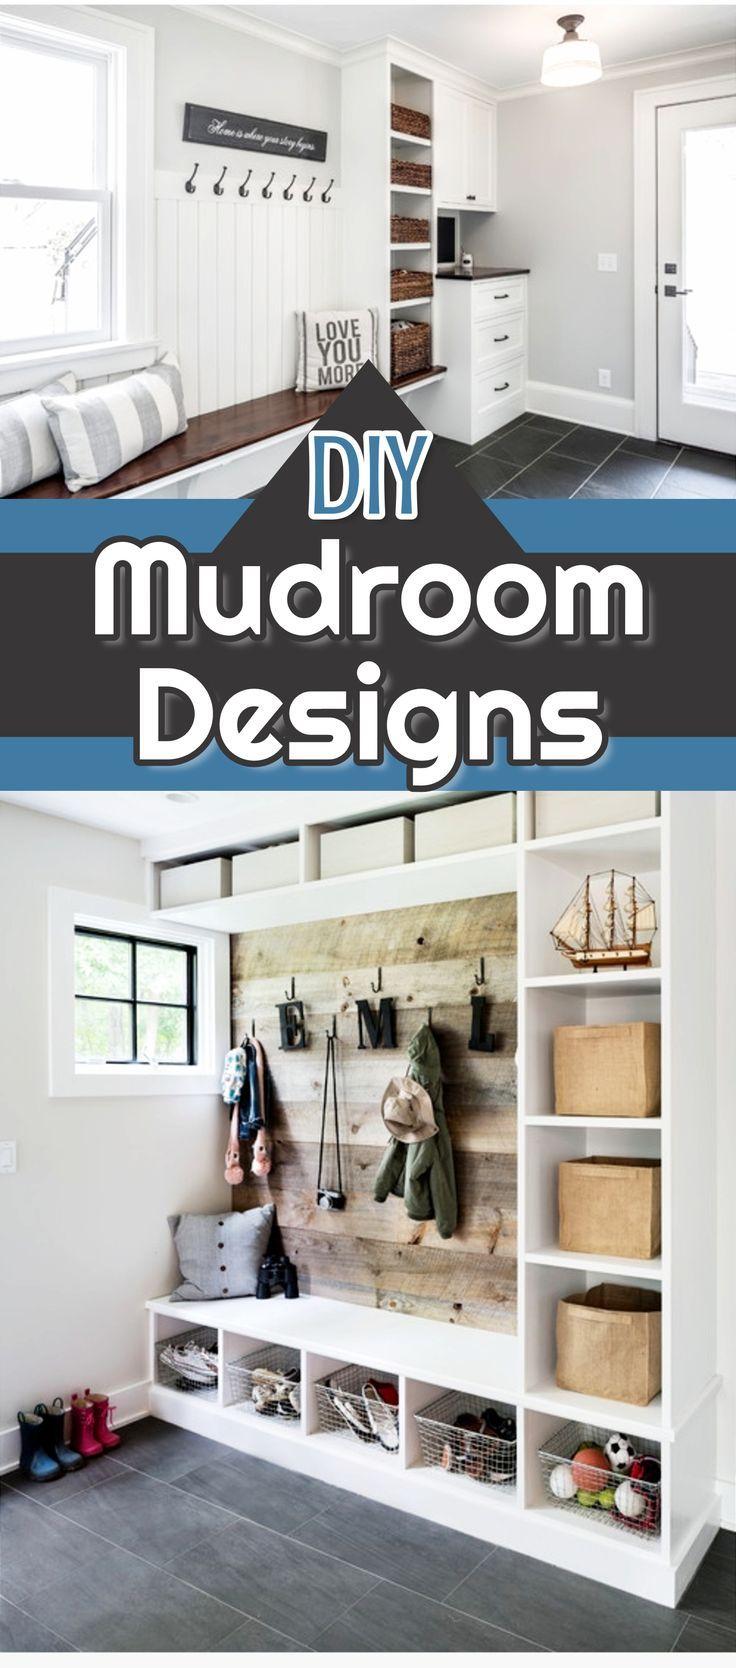 interior courses holistic las feng services decorating design vegas consulting shui